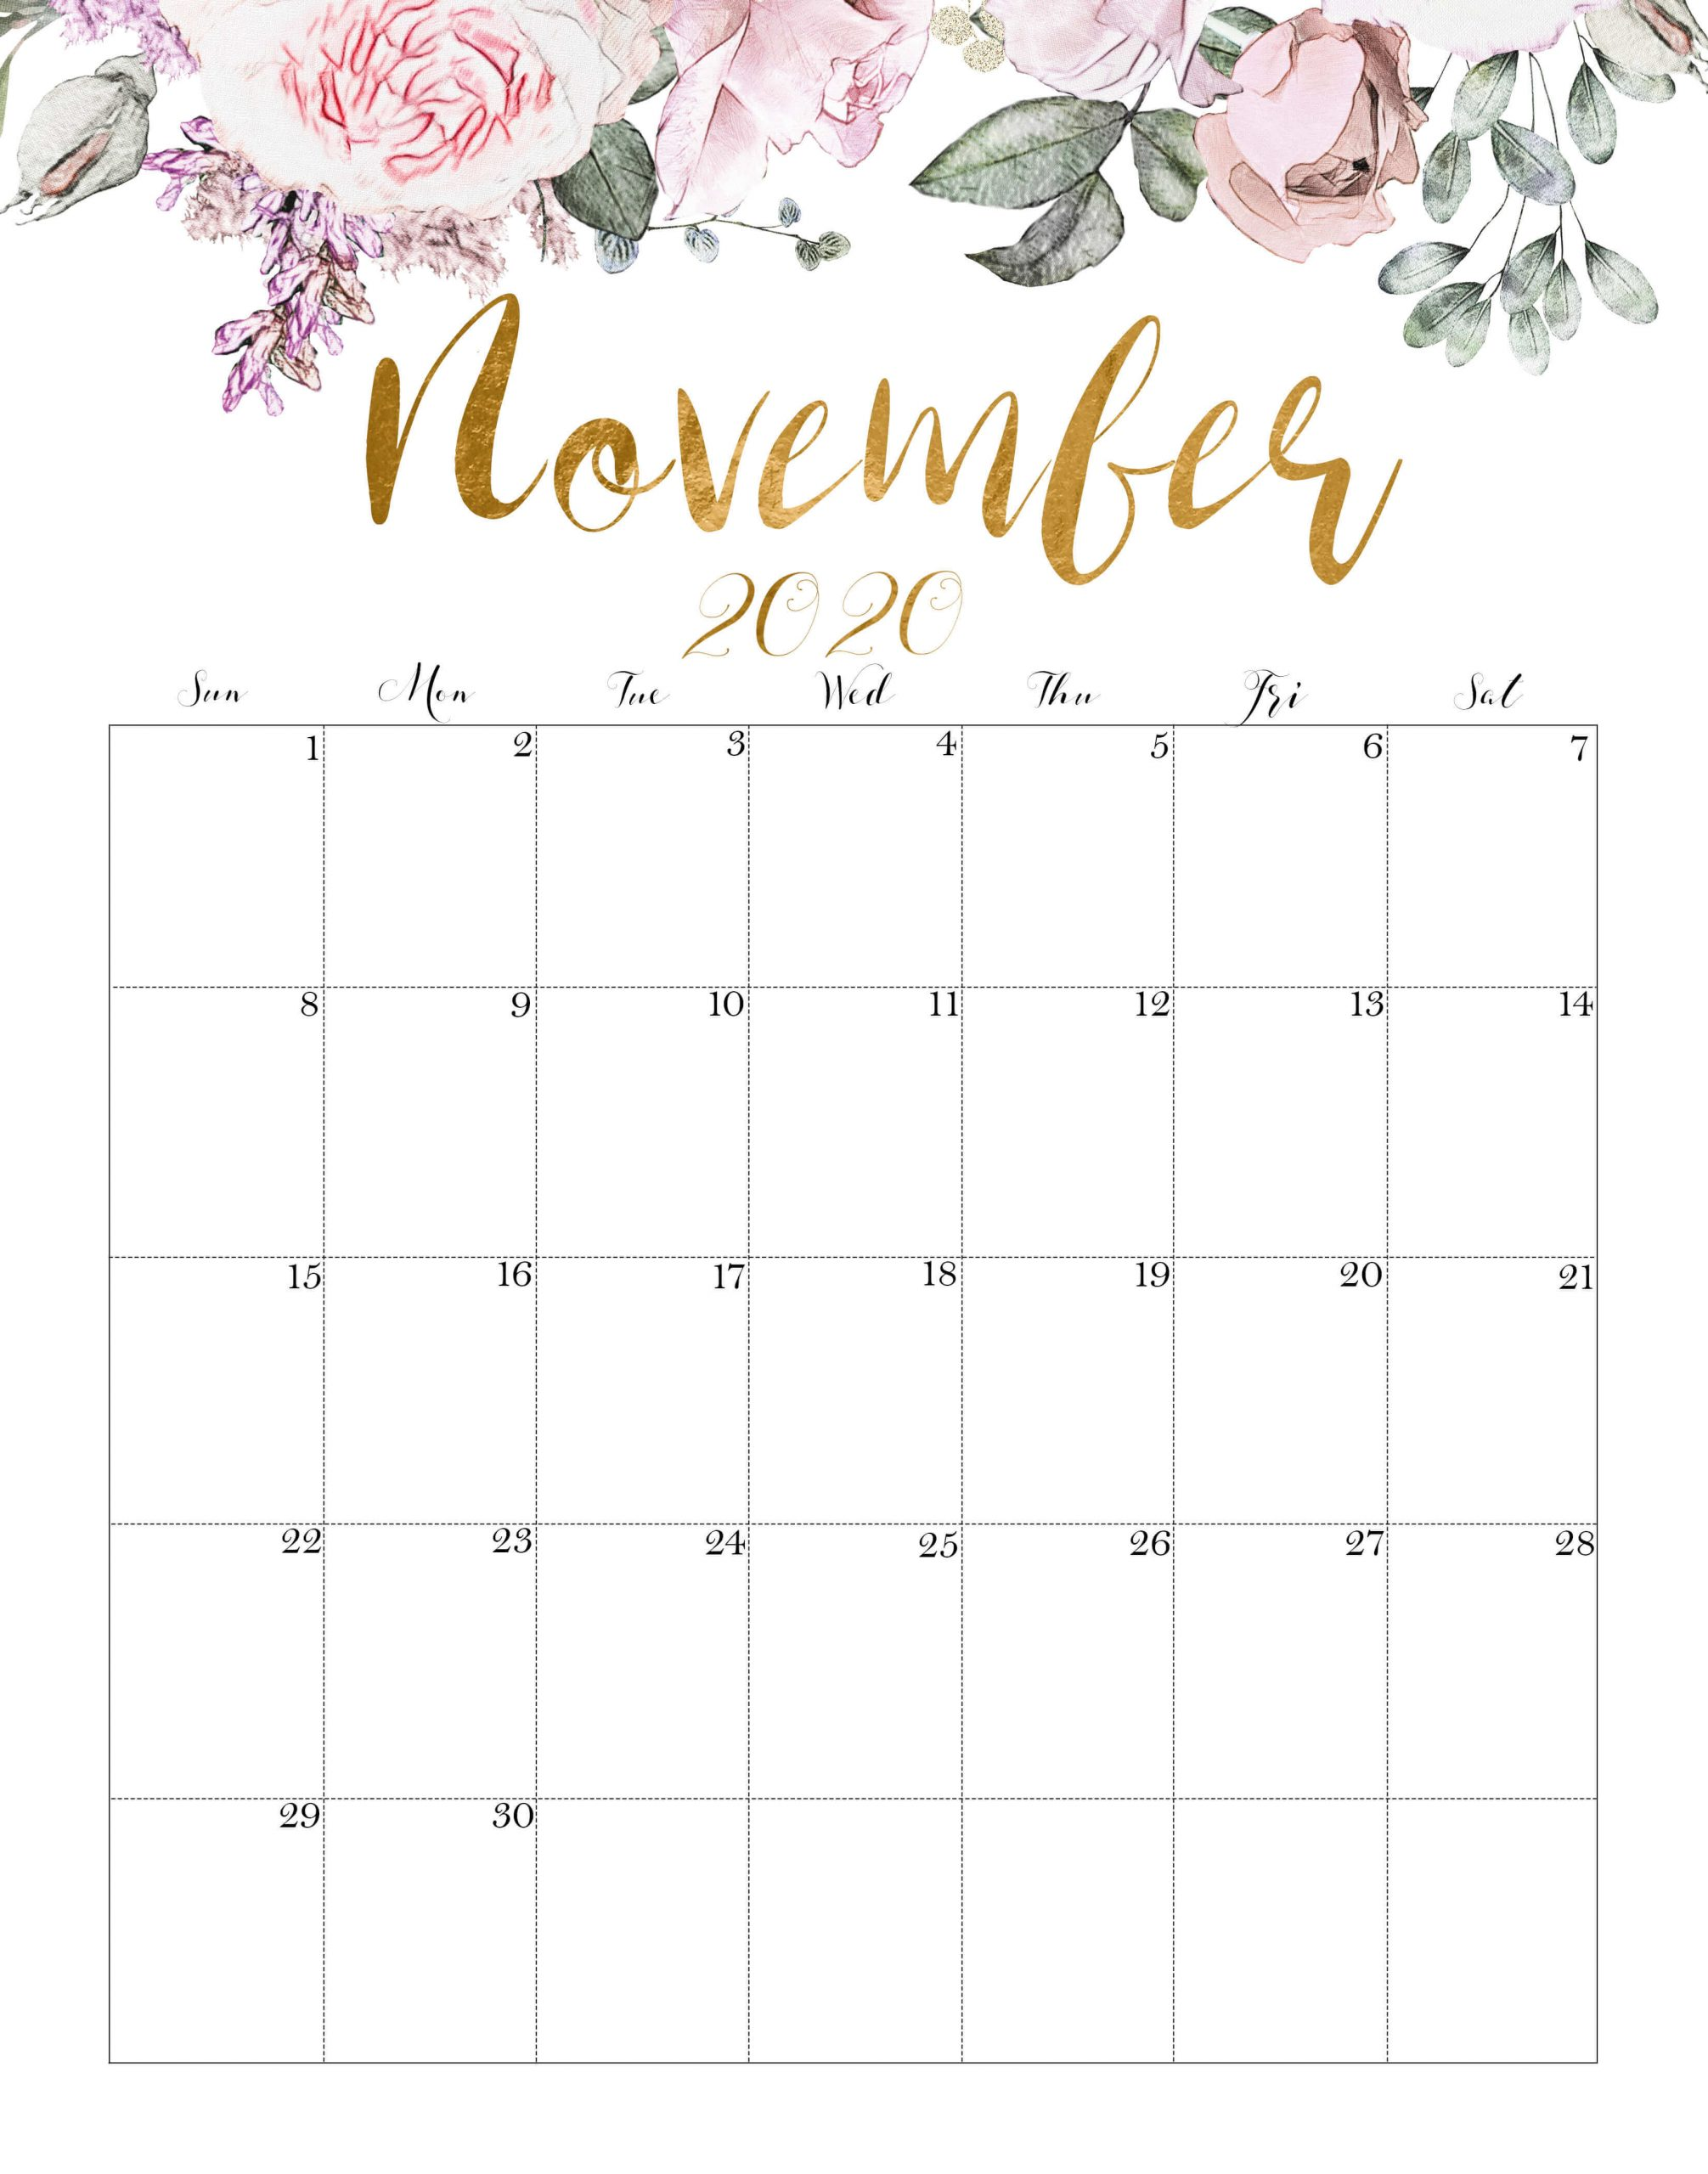 November 2020 Calendar Floral